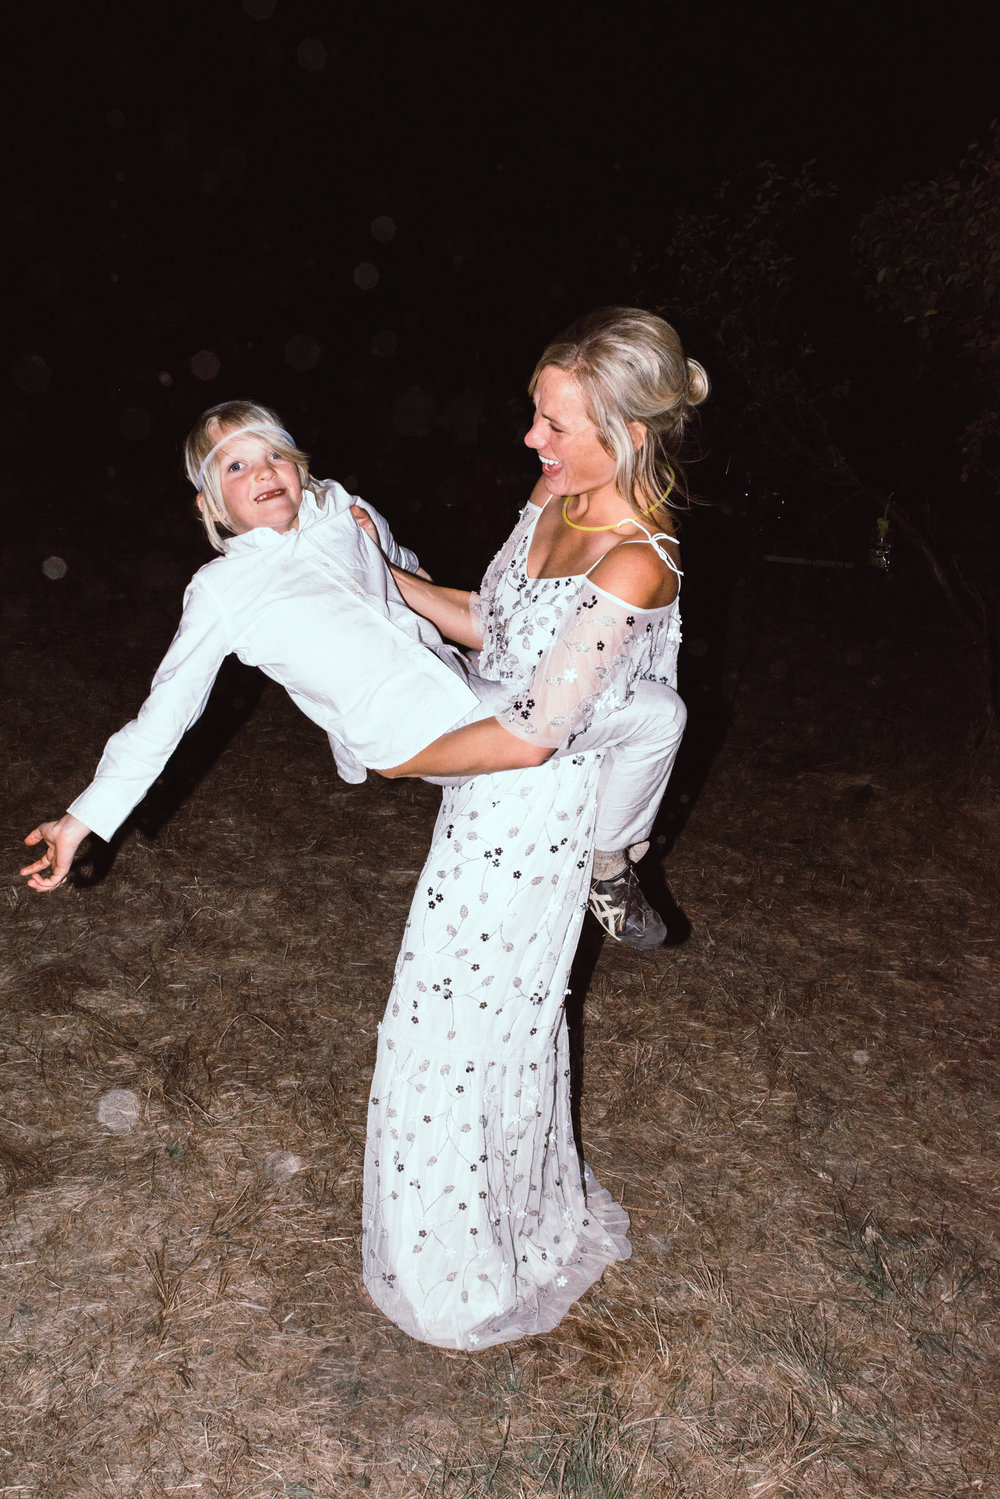 Lana Micah Wedding La Grande Oregon September 2018 Please Credit Talia Jean Galvin (668 of 687).jpg